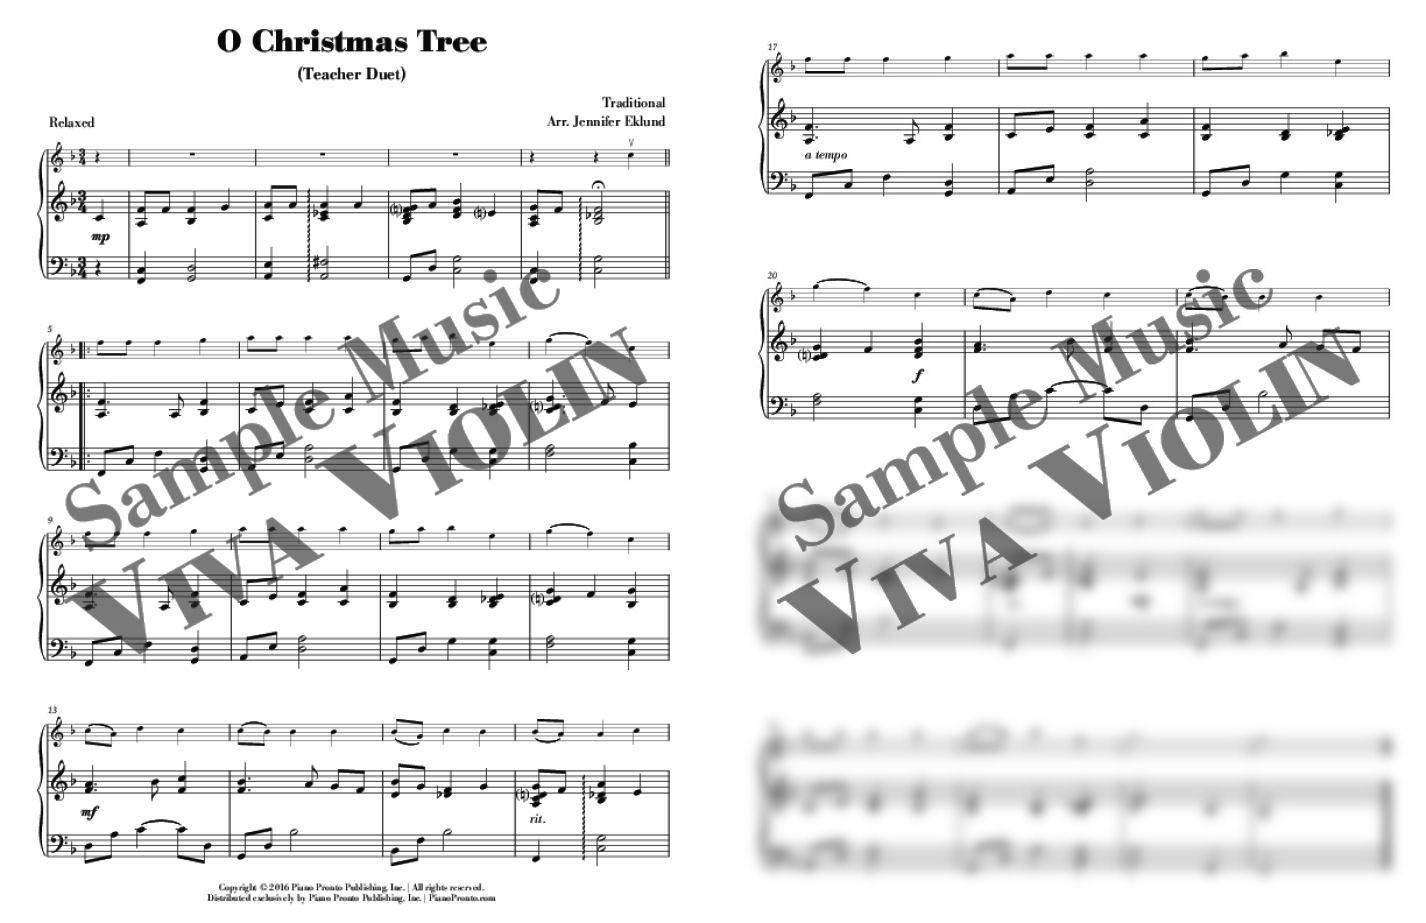 O Christmas Tree - Easy Violin Solo